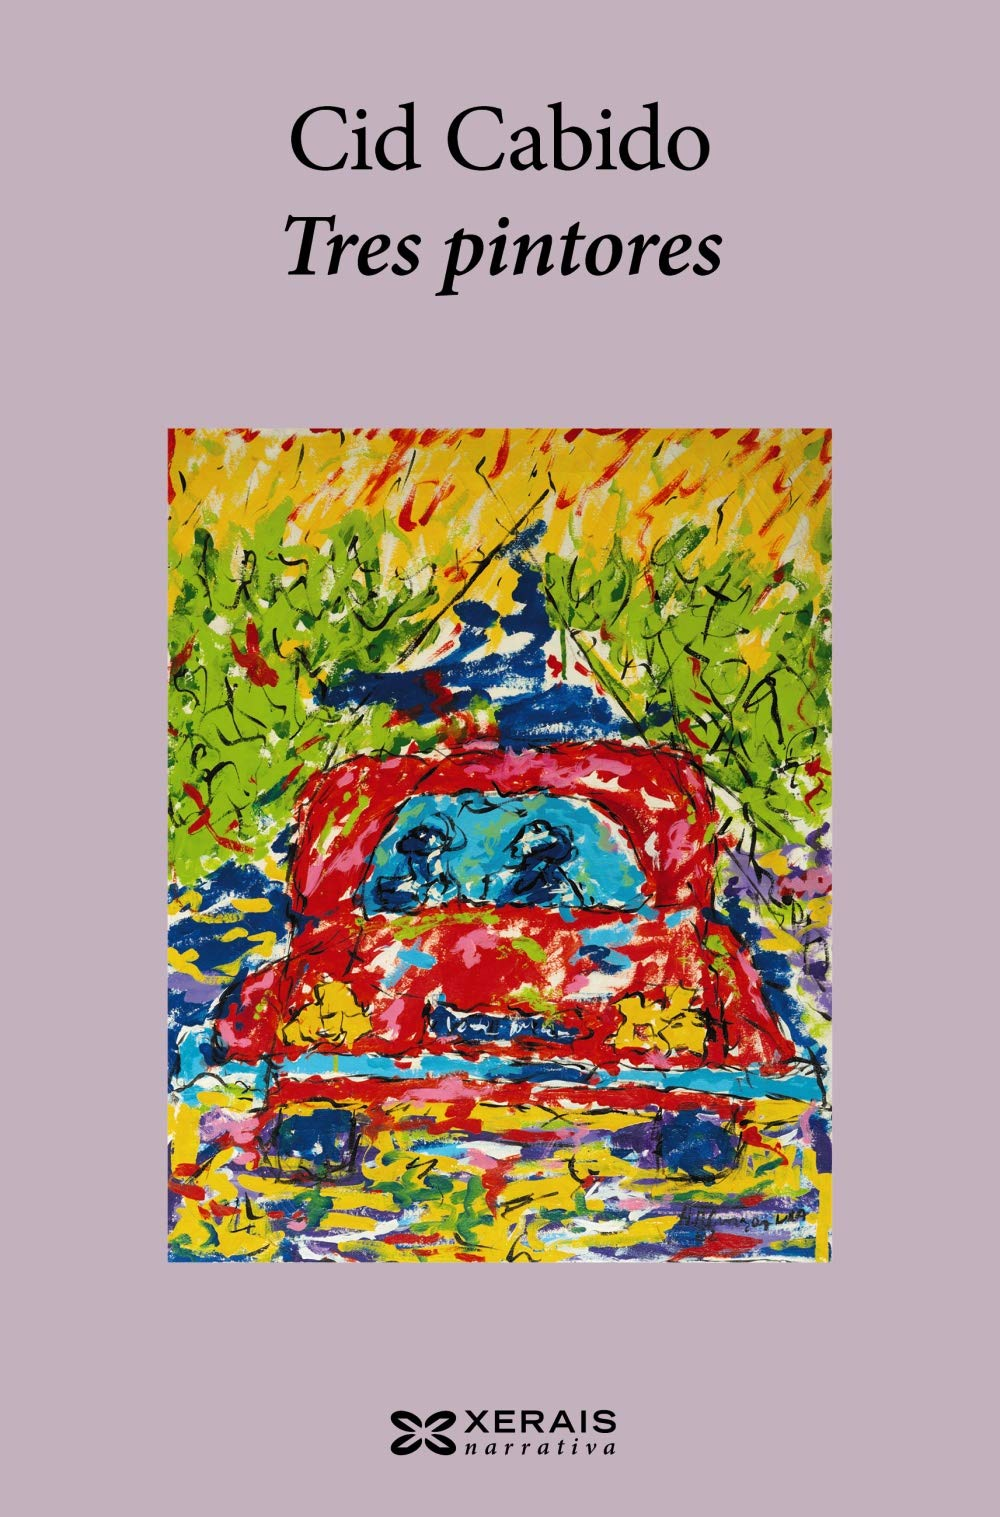 Tres pintores (Edición Literaria - Narrativa): Amazon.es: Cid Cabido: Libros